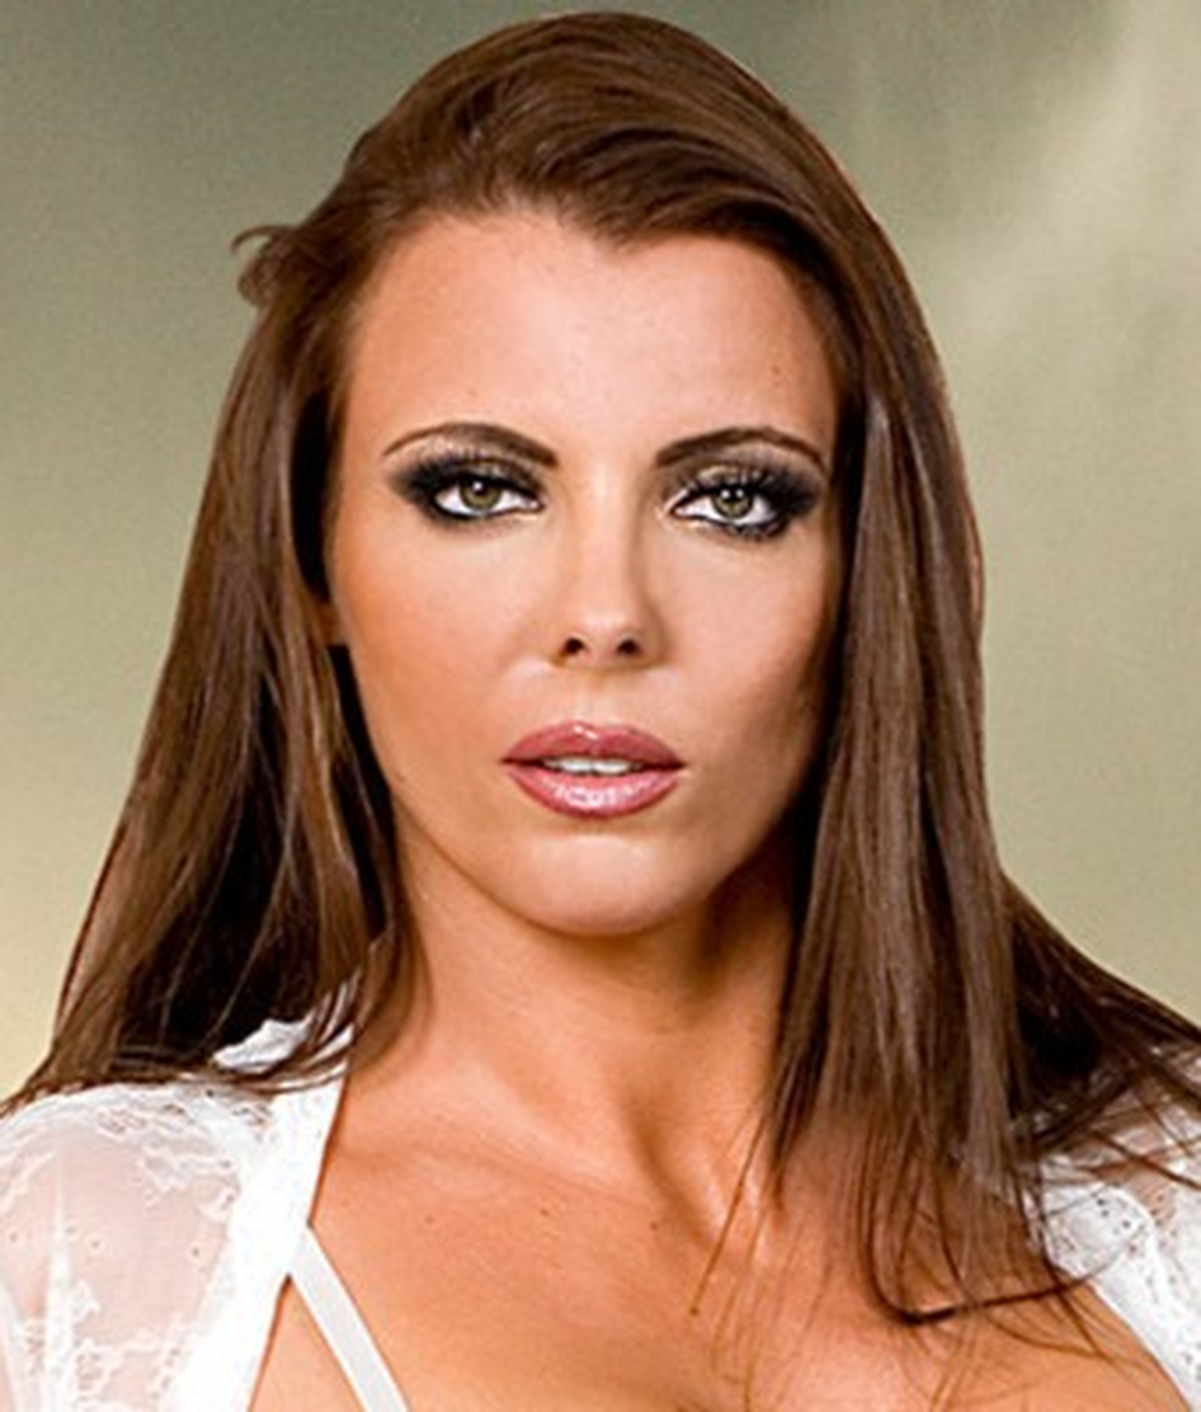 Caroline Tosca